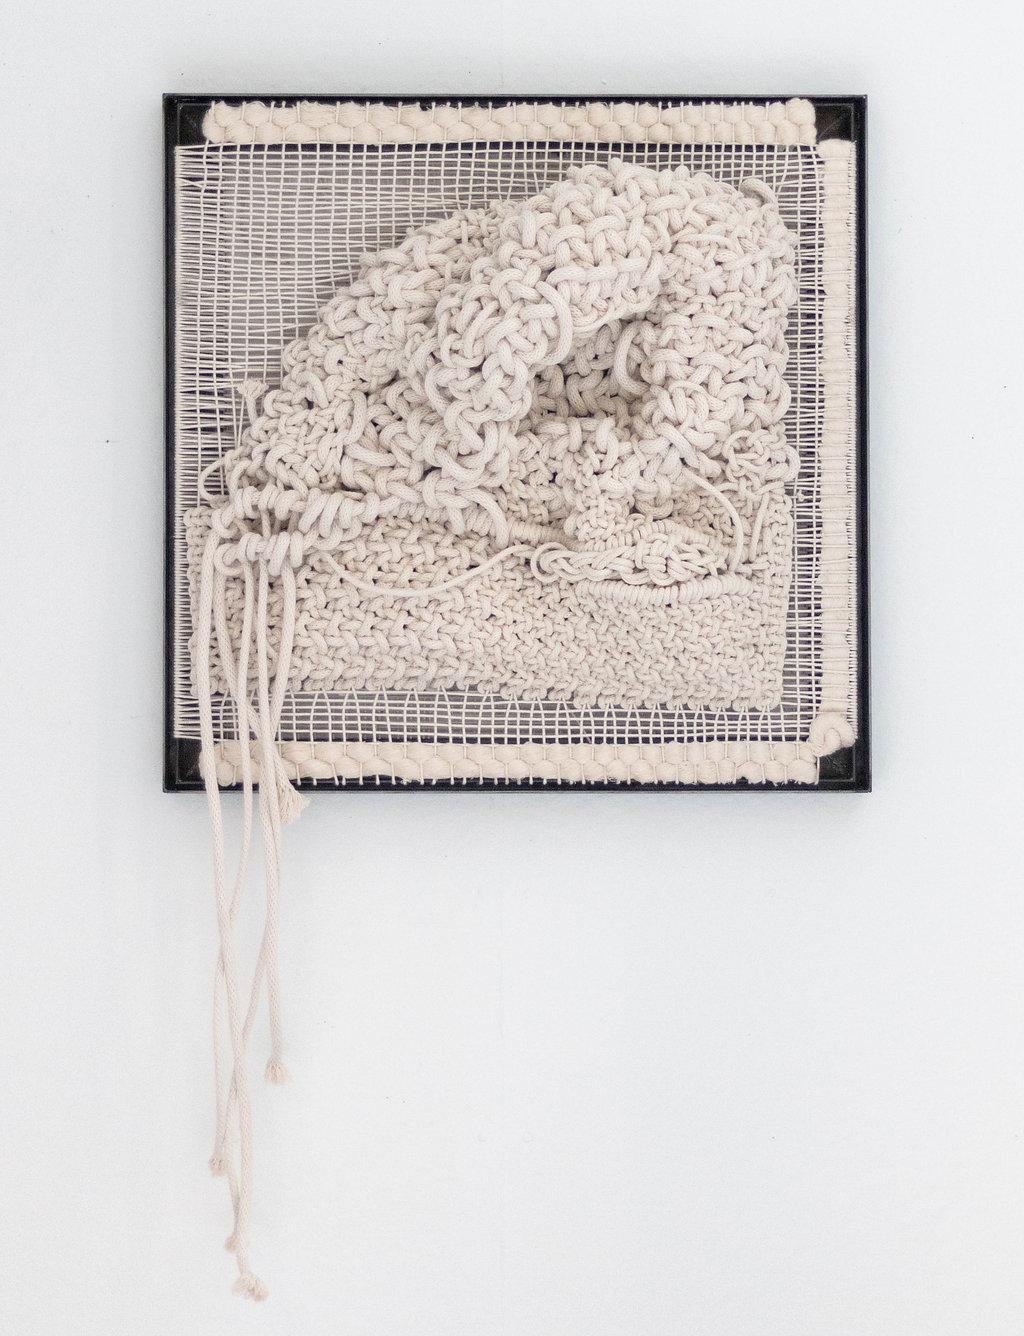 Jacqueline-Surdell-Artist-Sculpture-Lets-Be-Stars-04.jpg